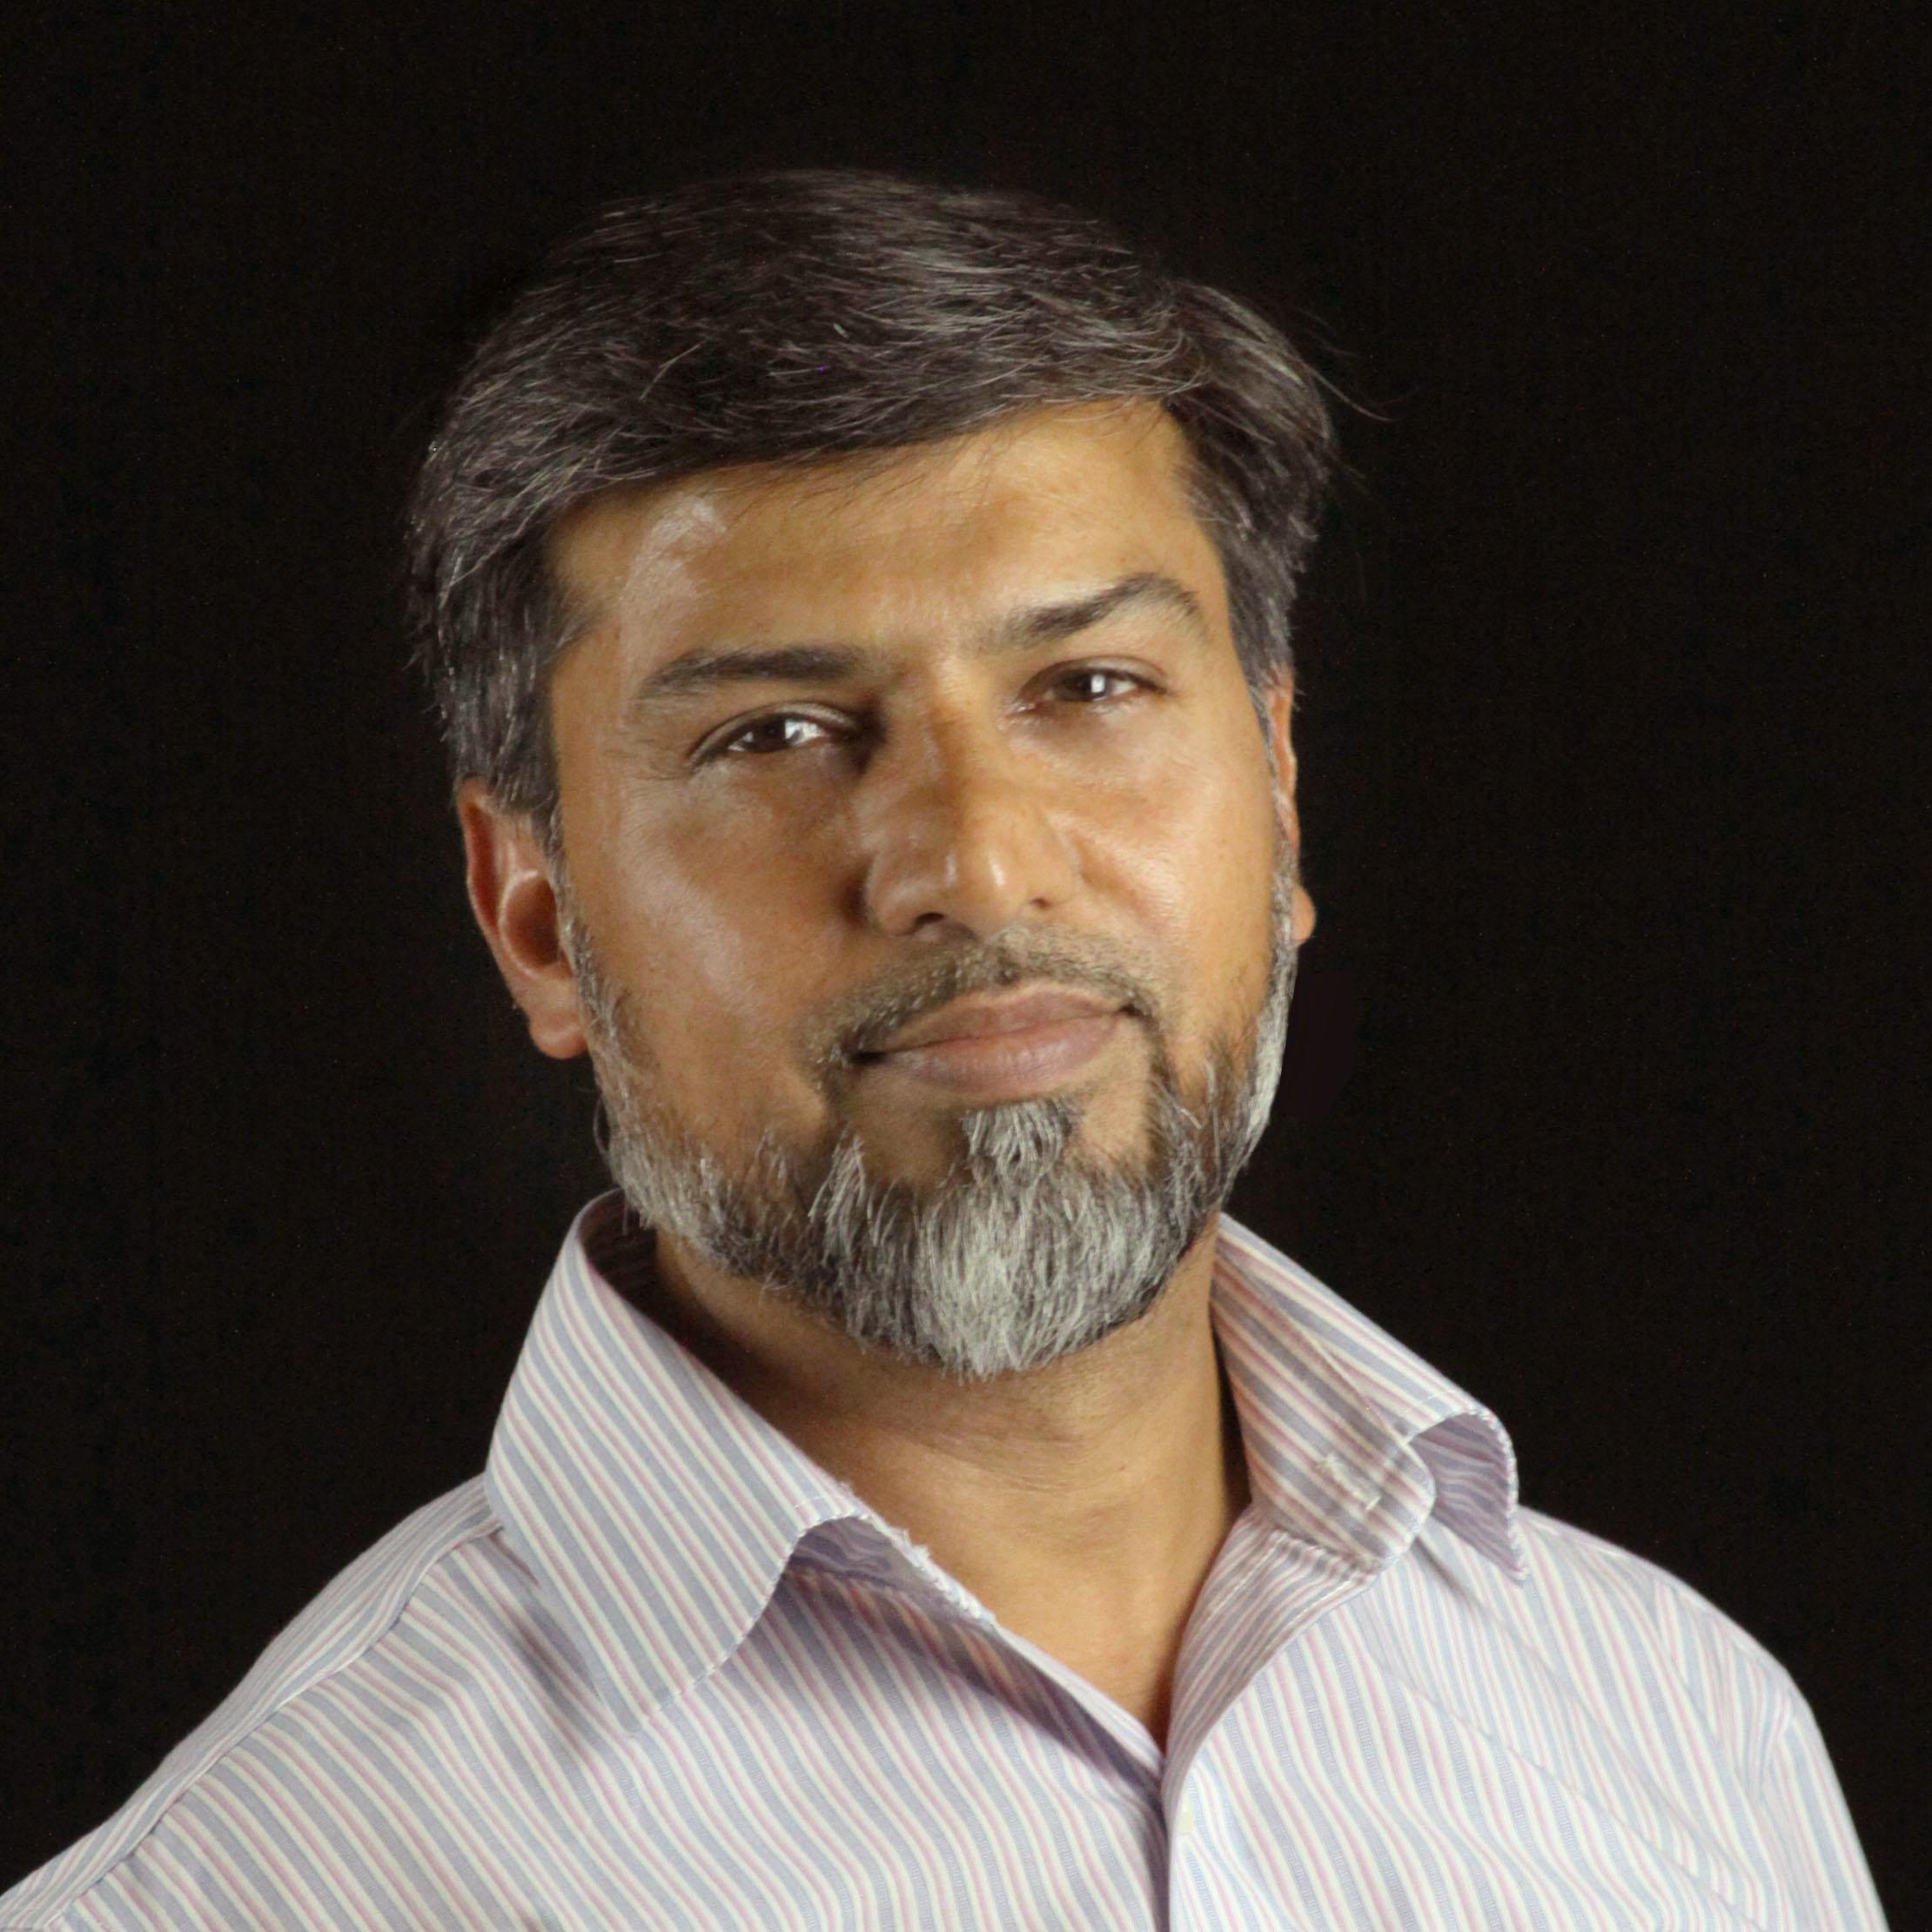 Kashif Ahmed